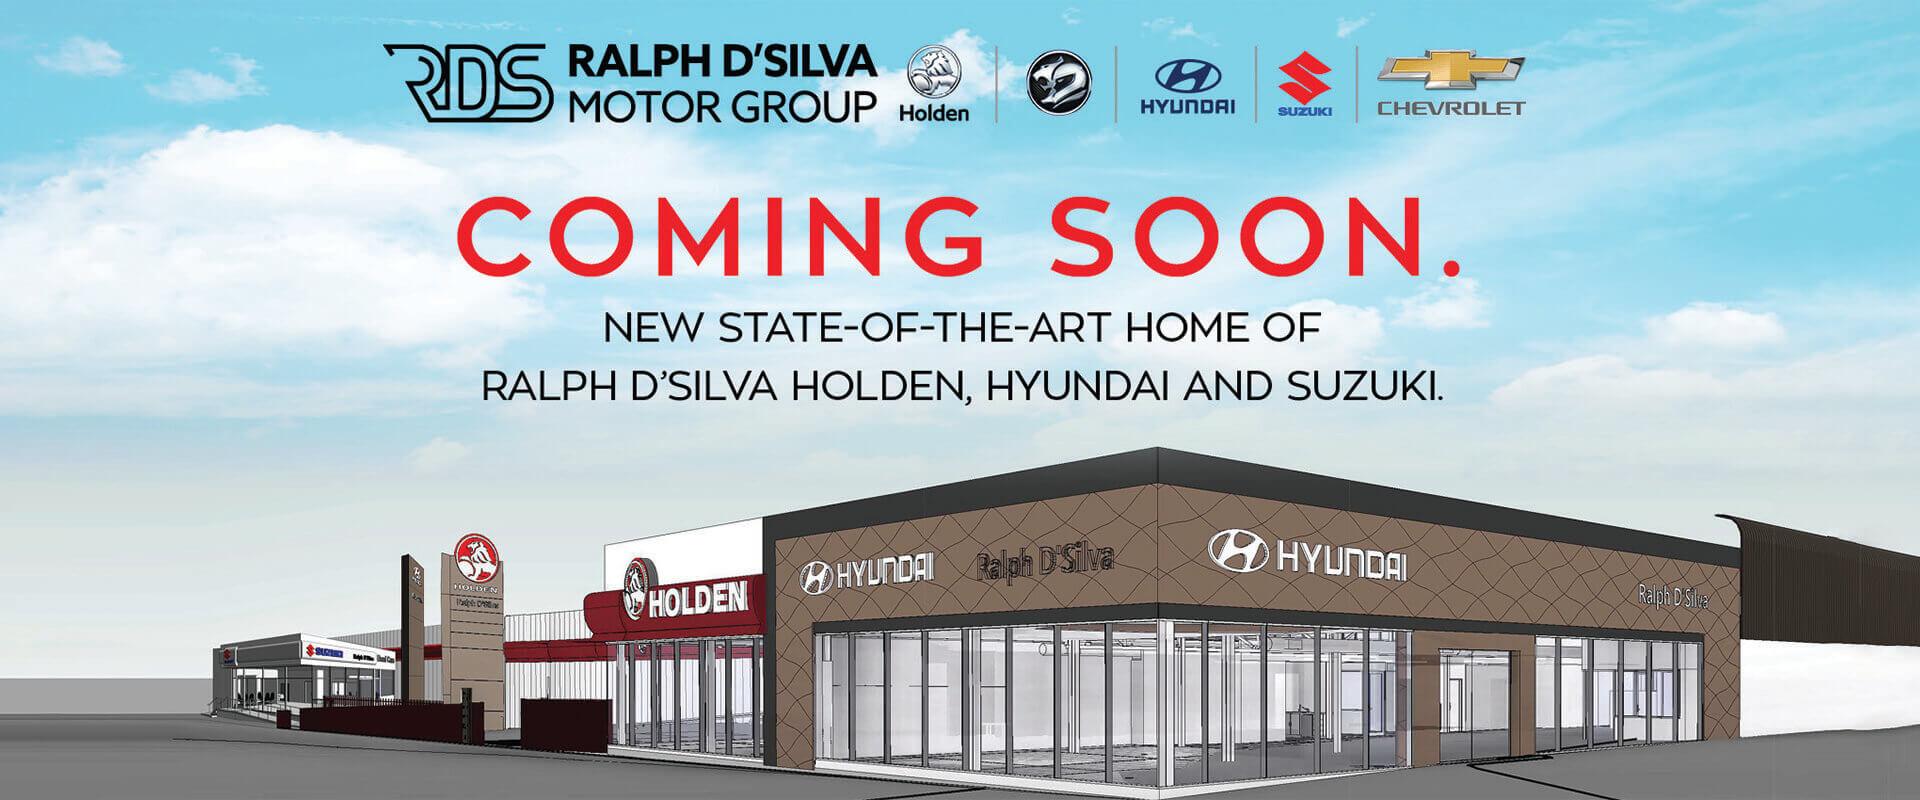 New Home of Ralph DSilva